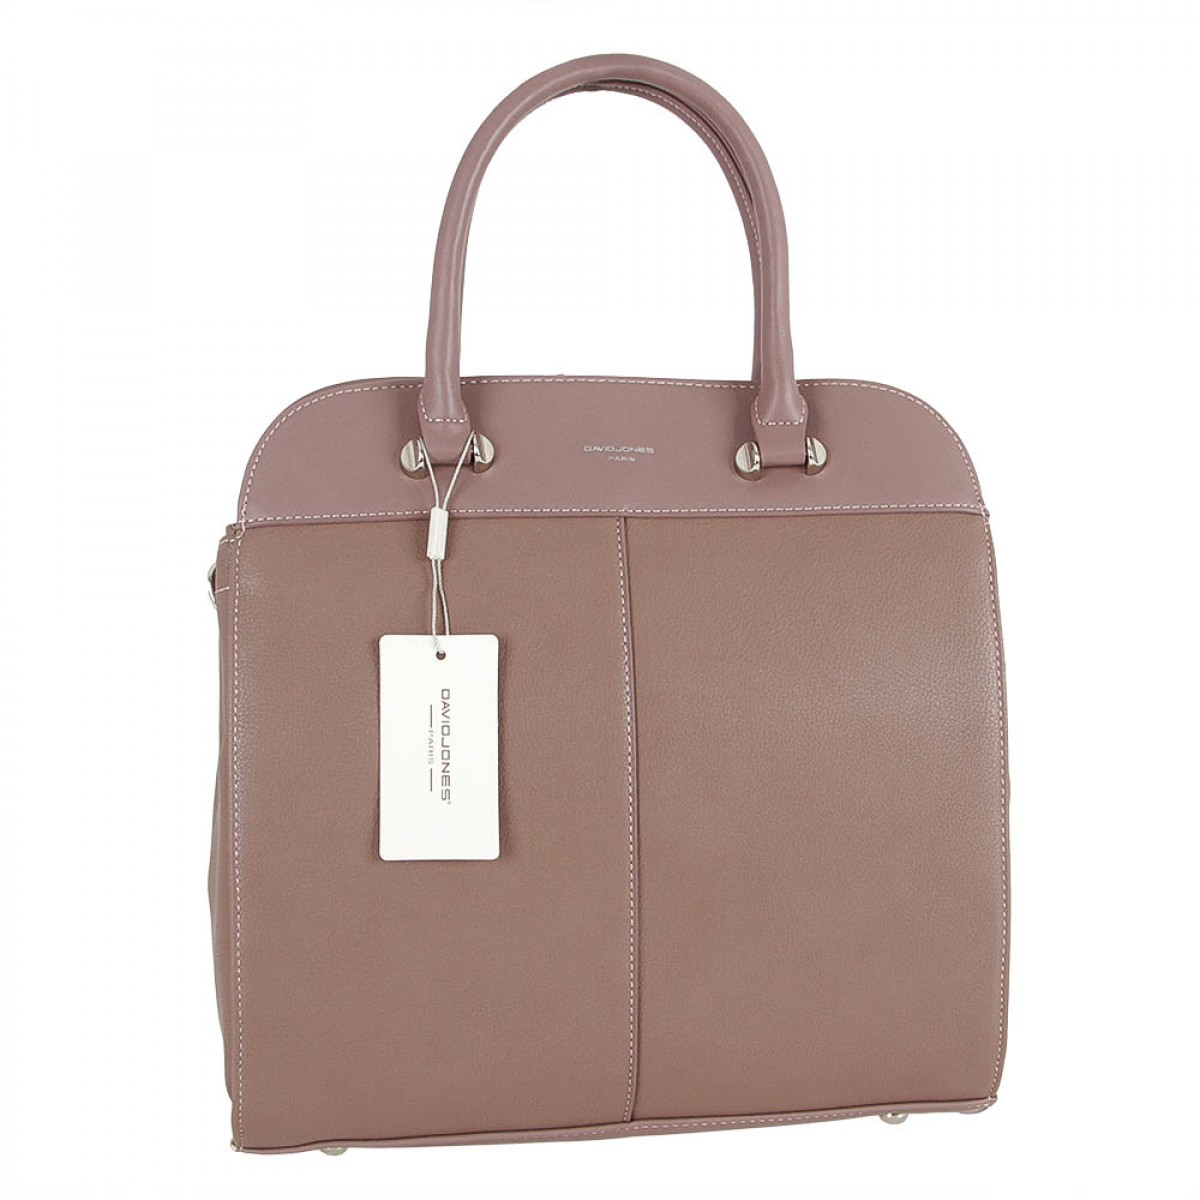 Жіноча сумка David Jones 5807-1 D.PINK